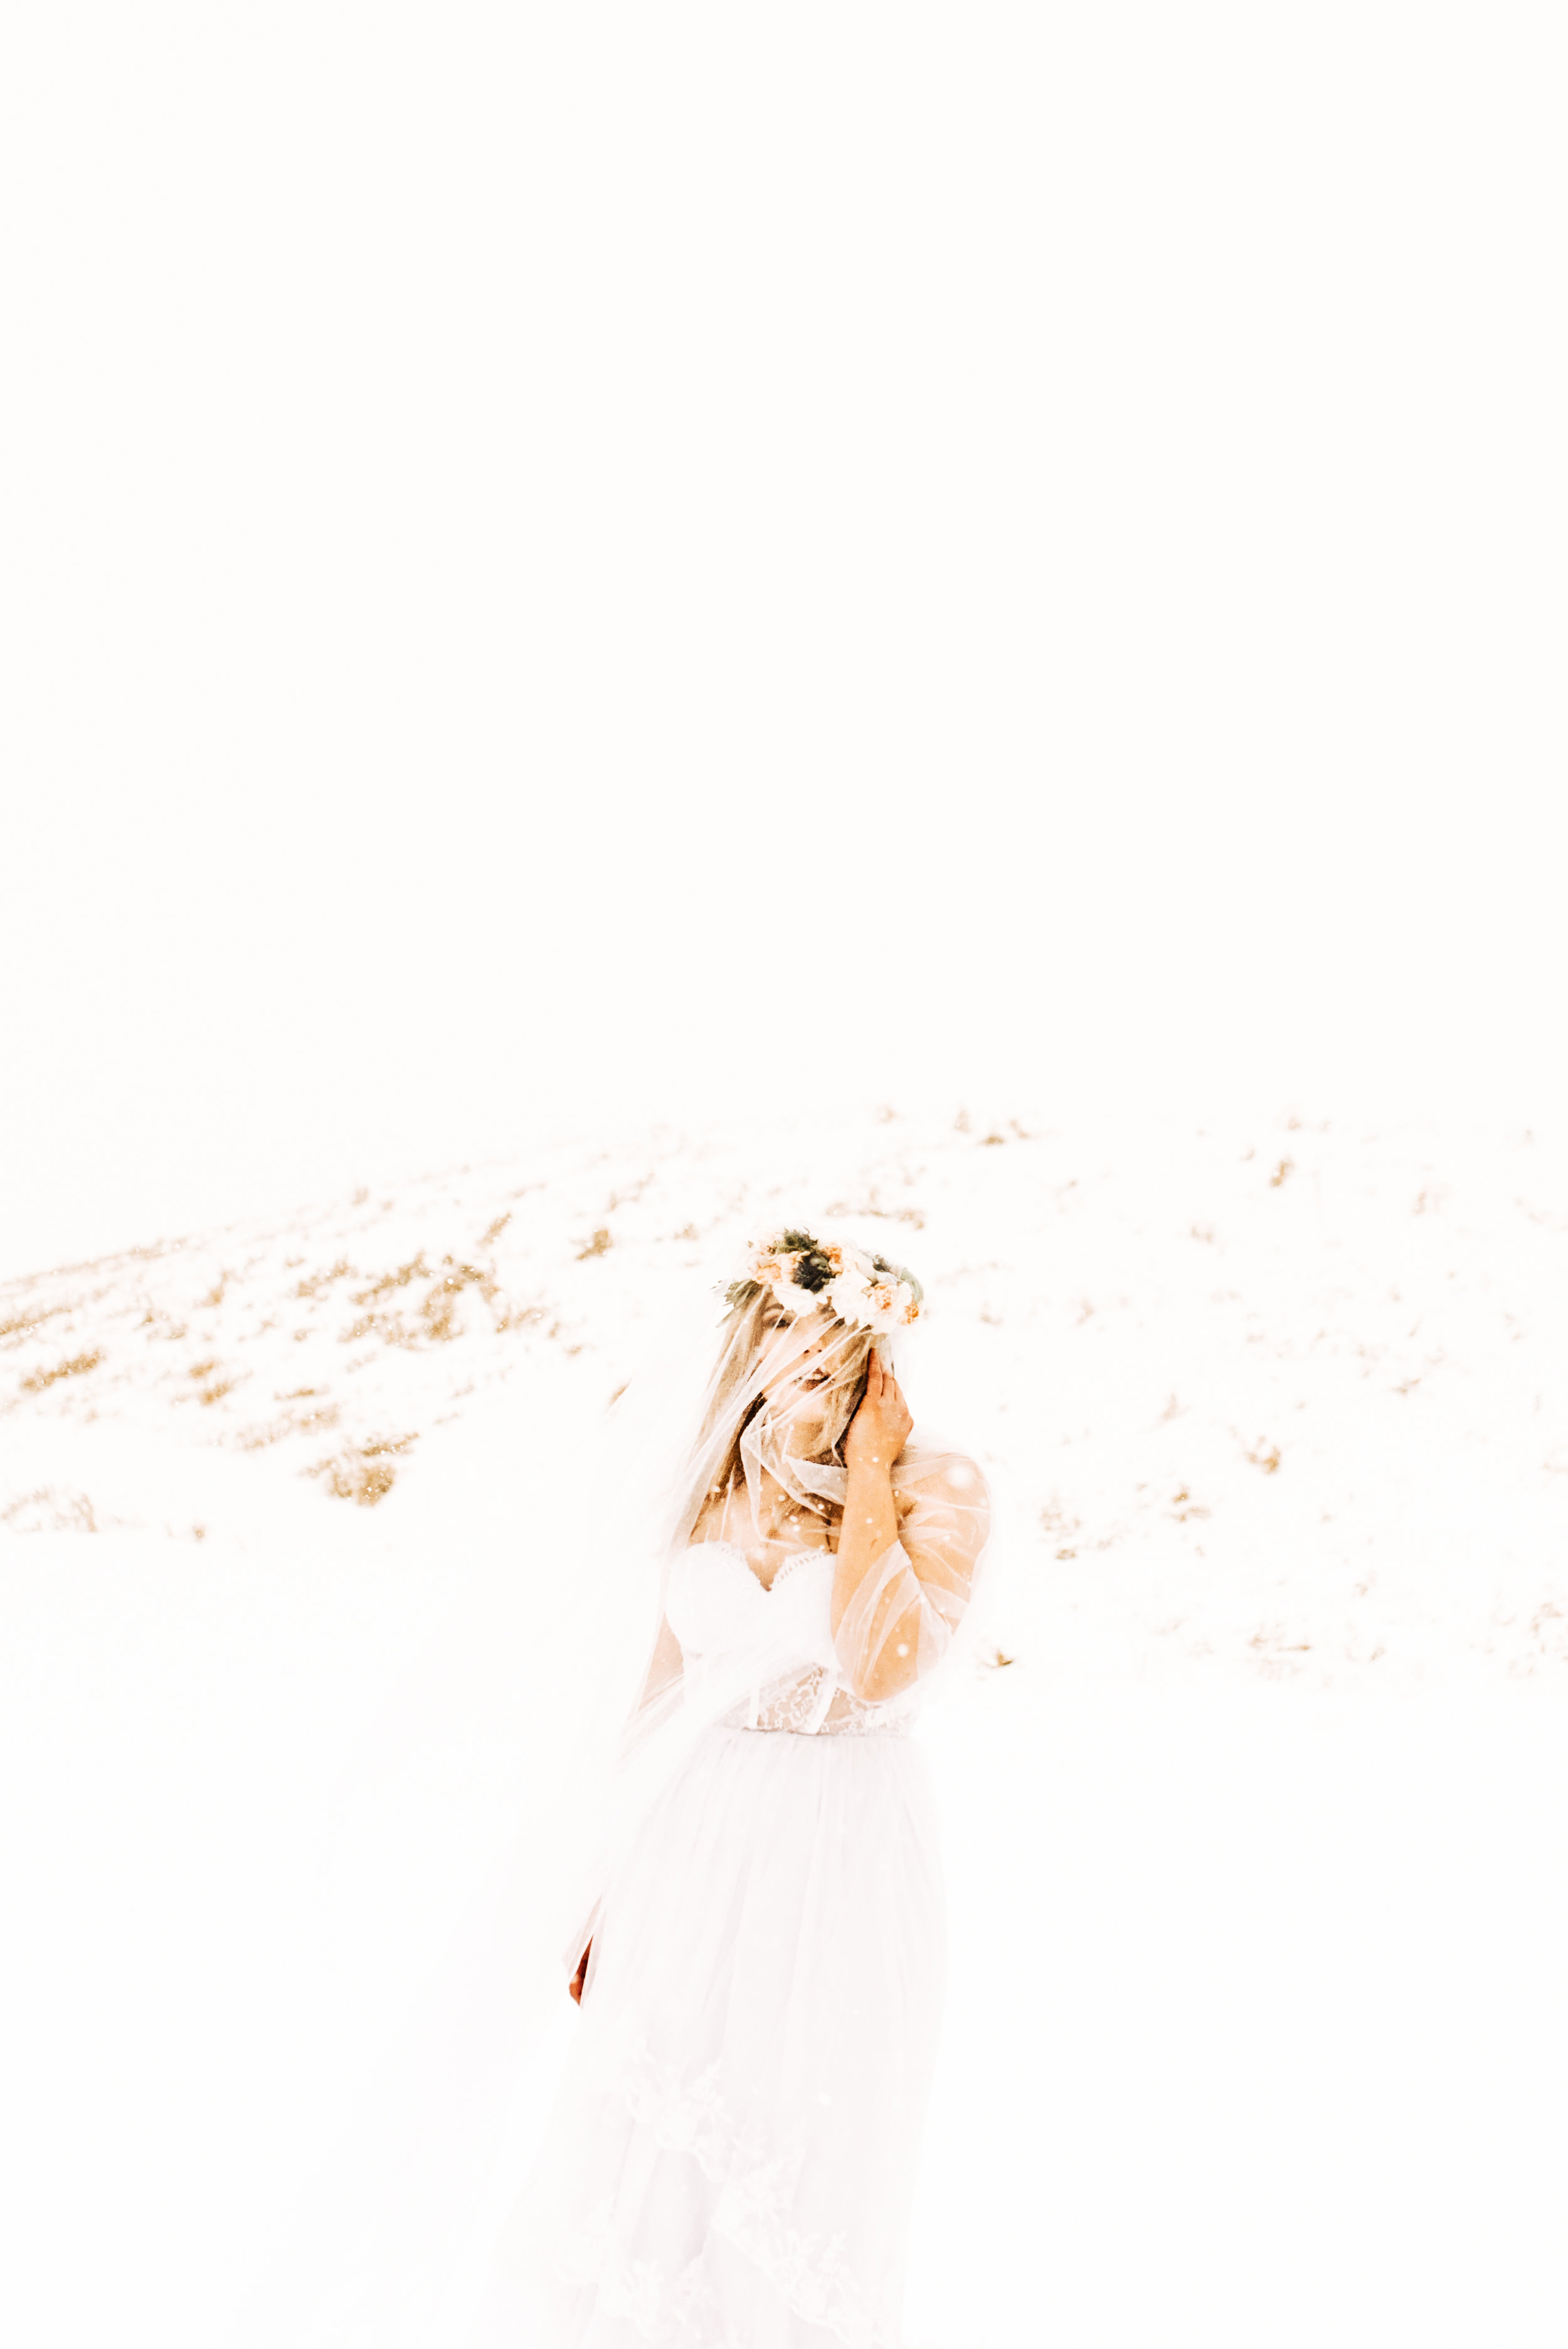 ShelbyTaylorPhotography-7.jpg